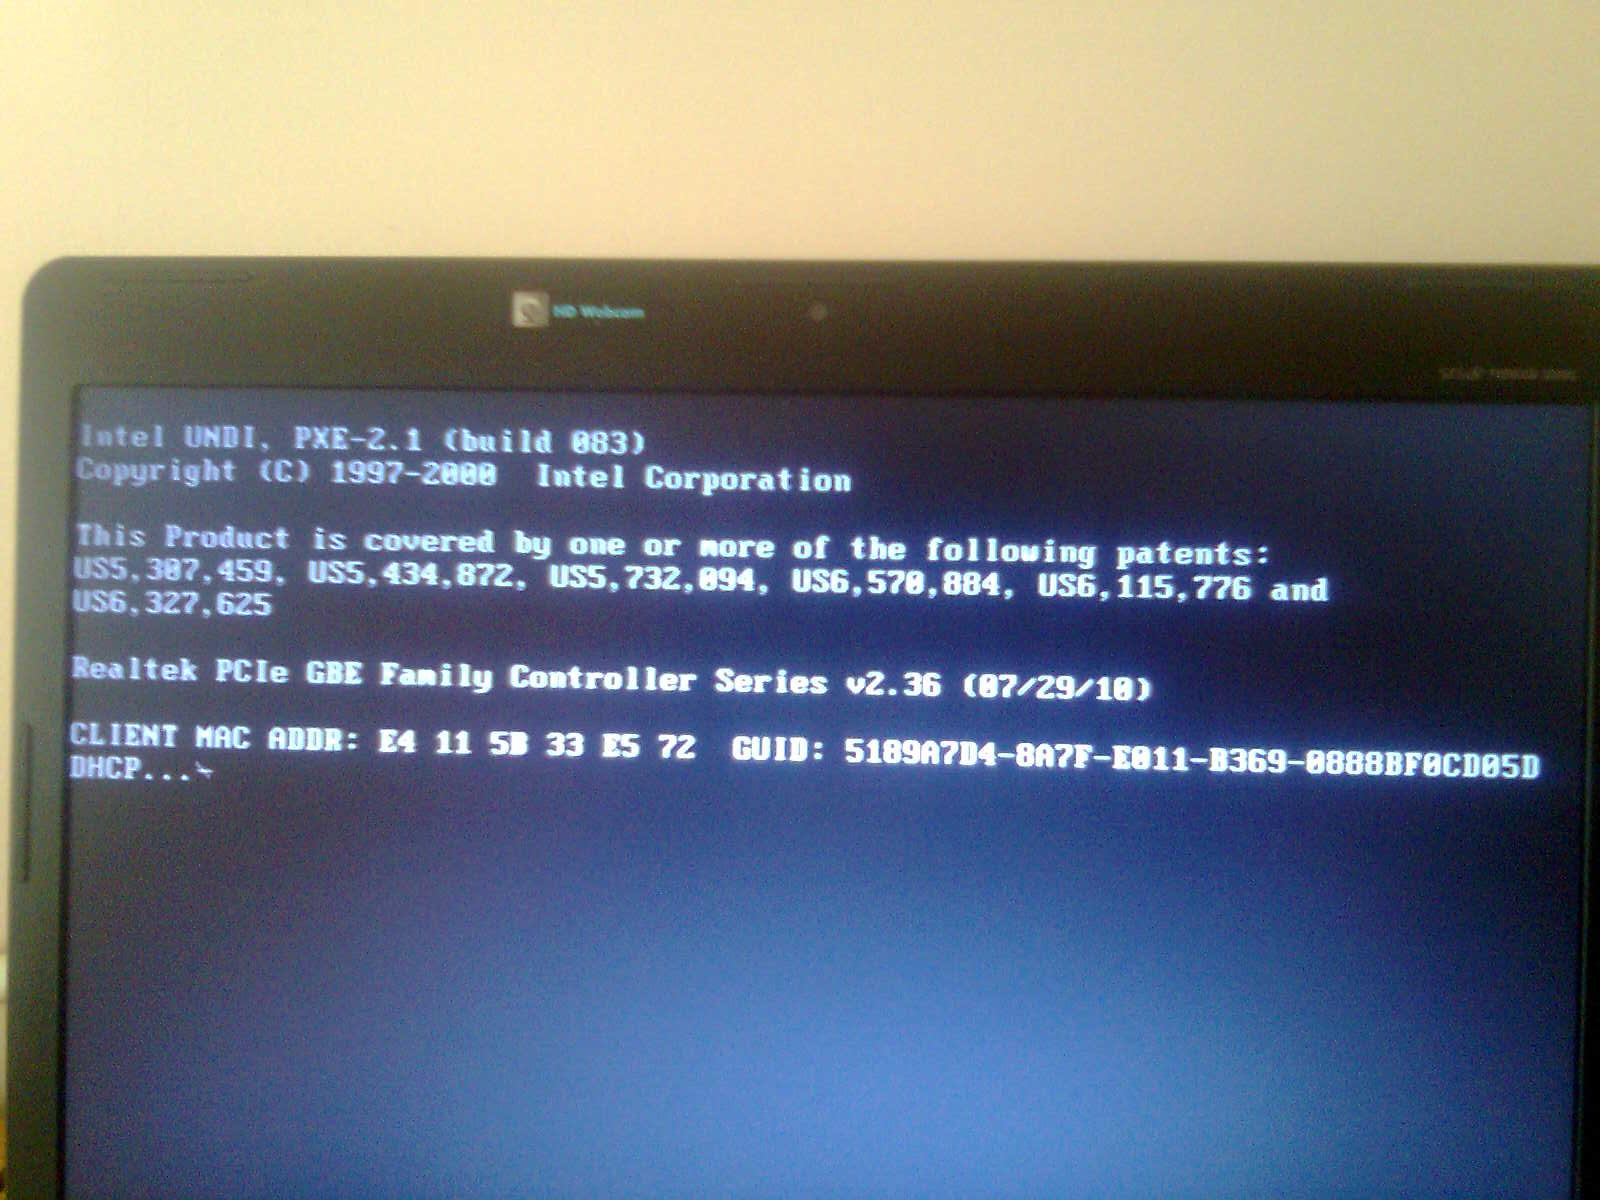 installation failed with error 0x80070103